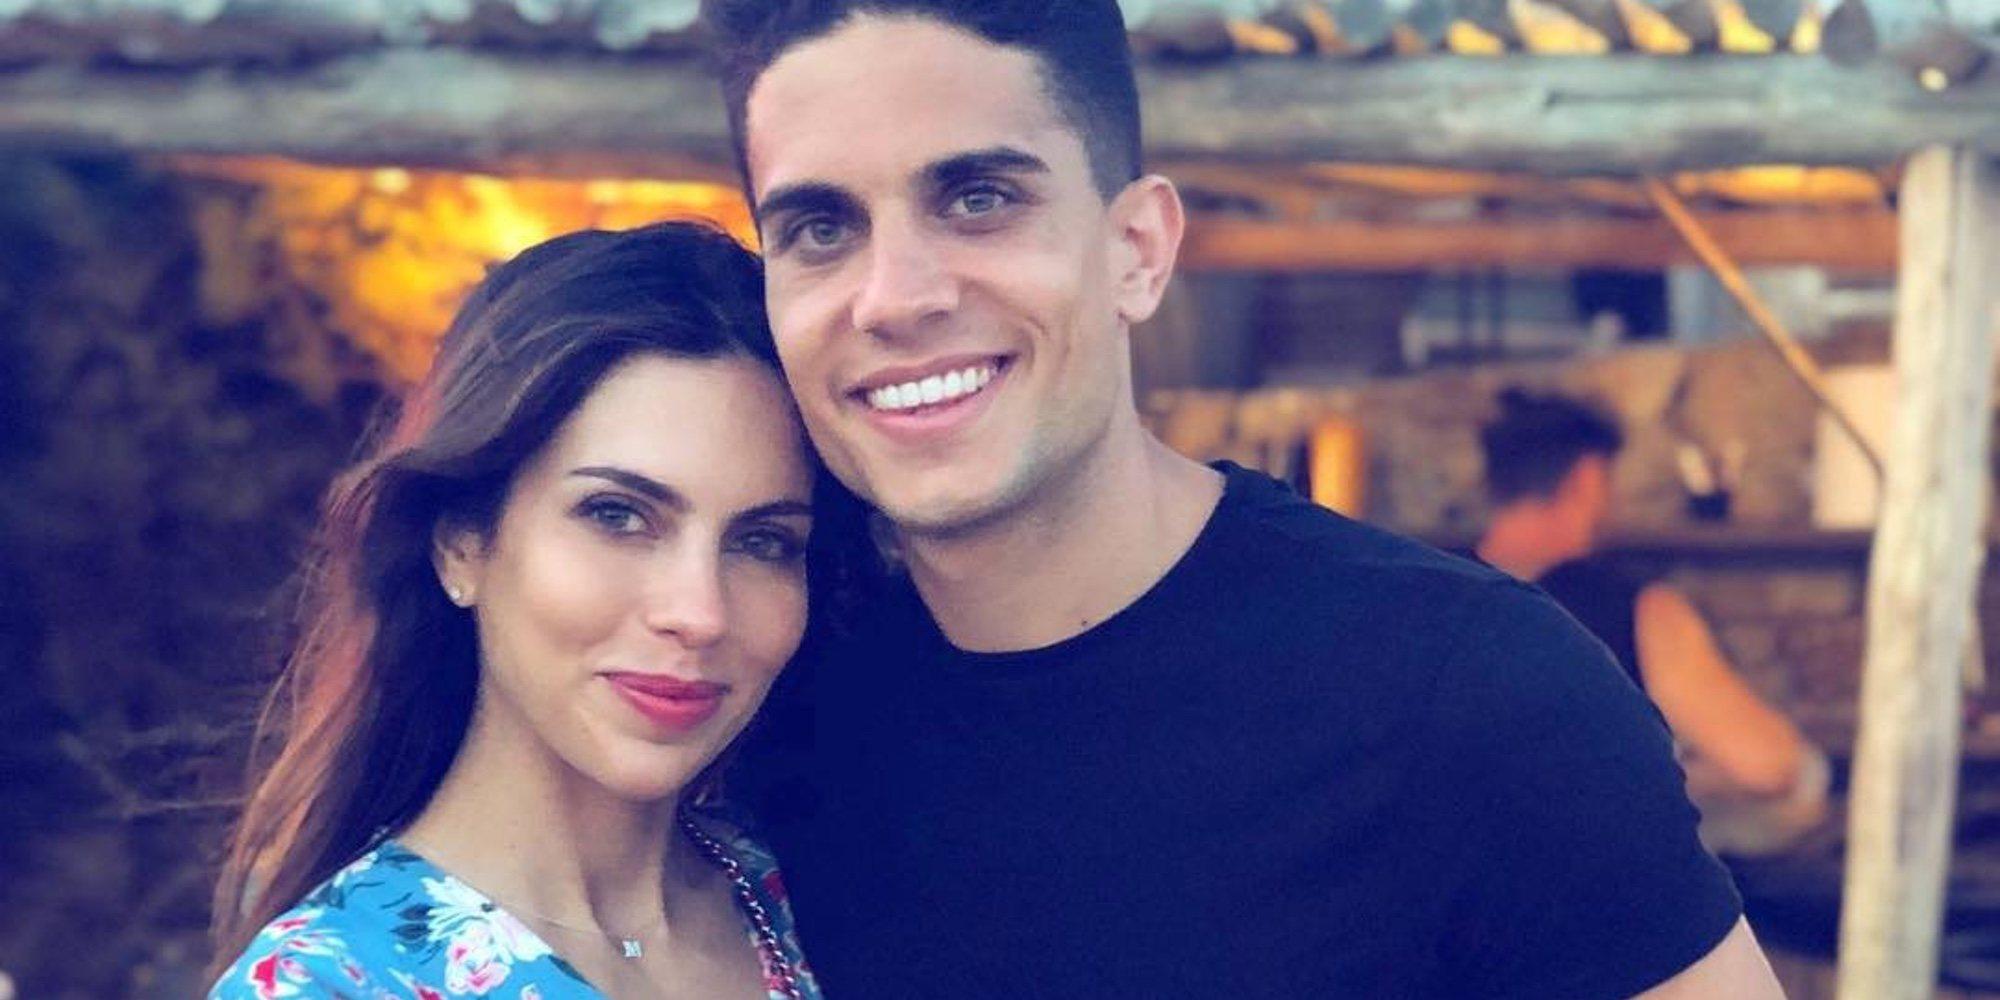 Marc Bartra y Melissa Jiménez serán padres por tercera vez